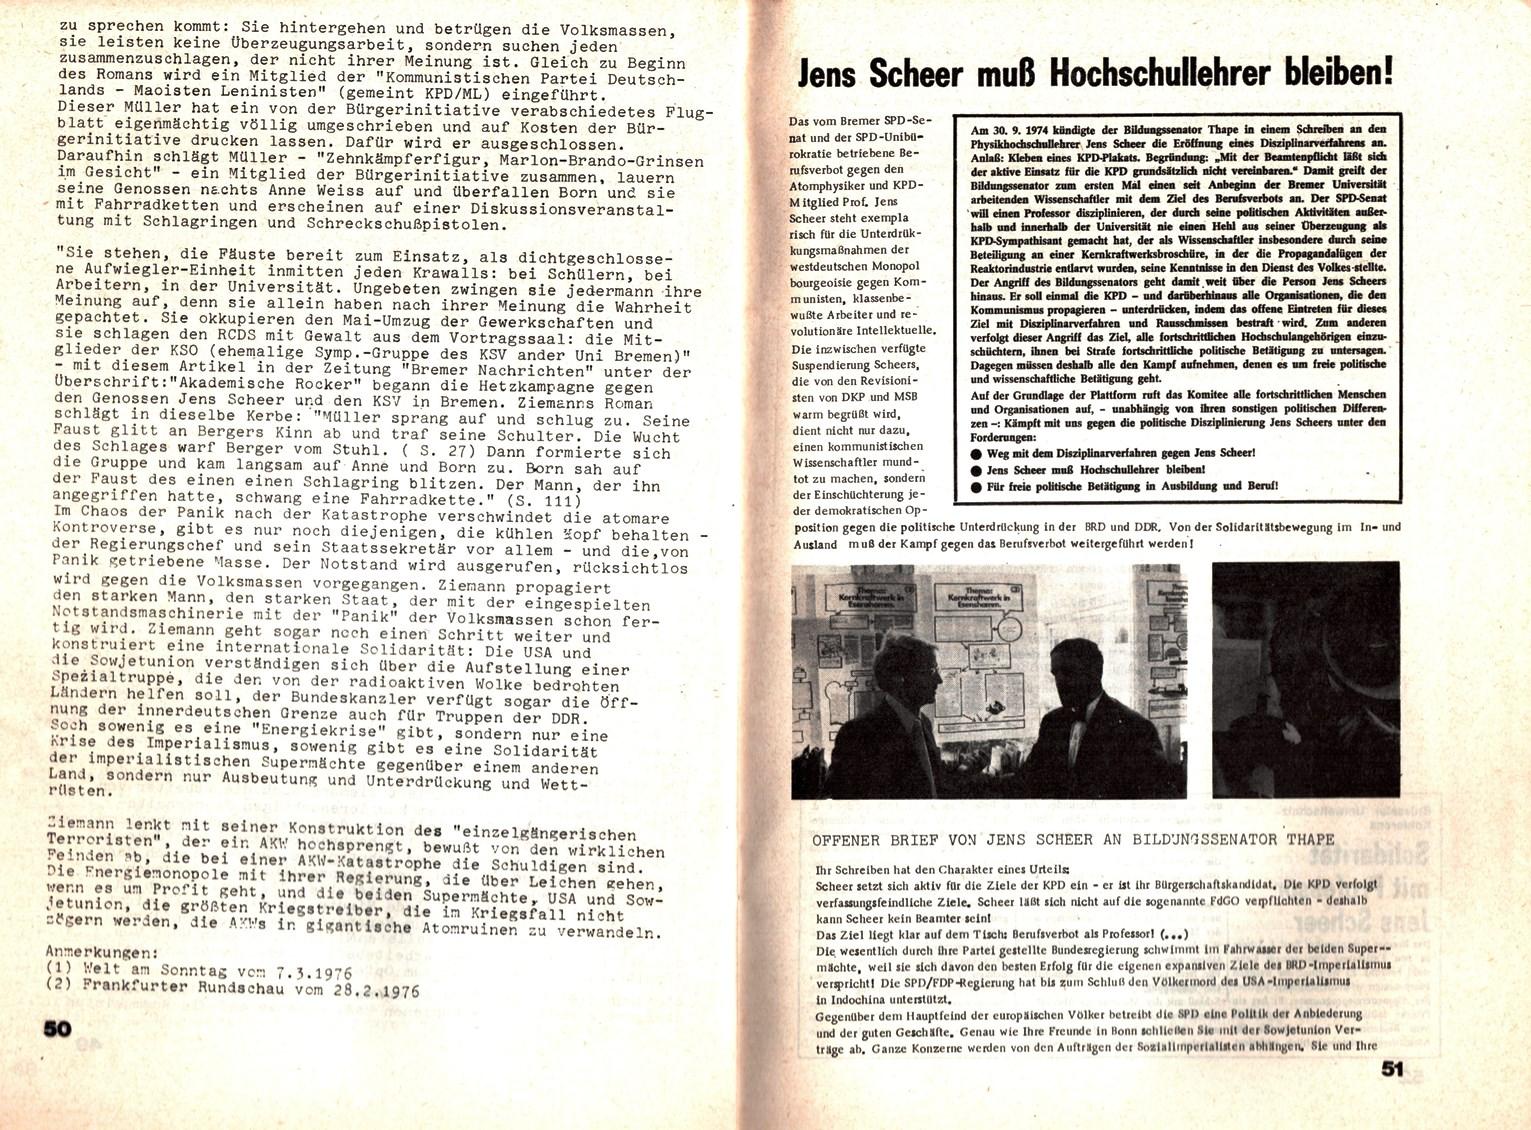 KSV_1976_Atomenergie_im_Kapitalismus_027